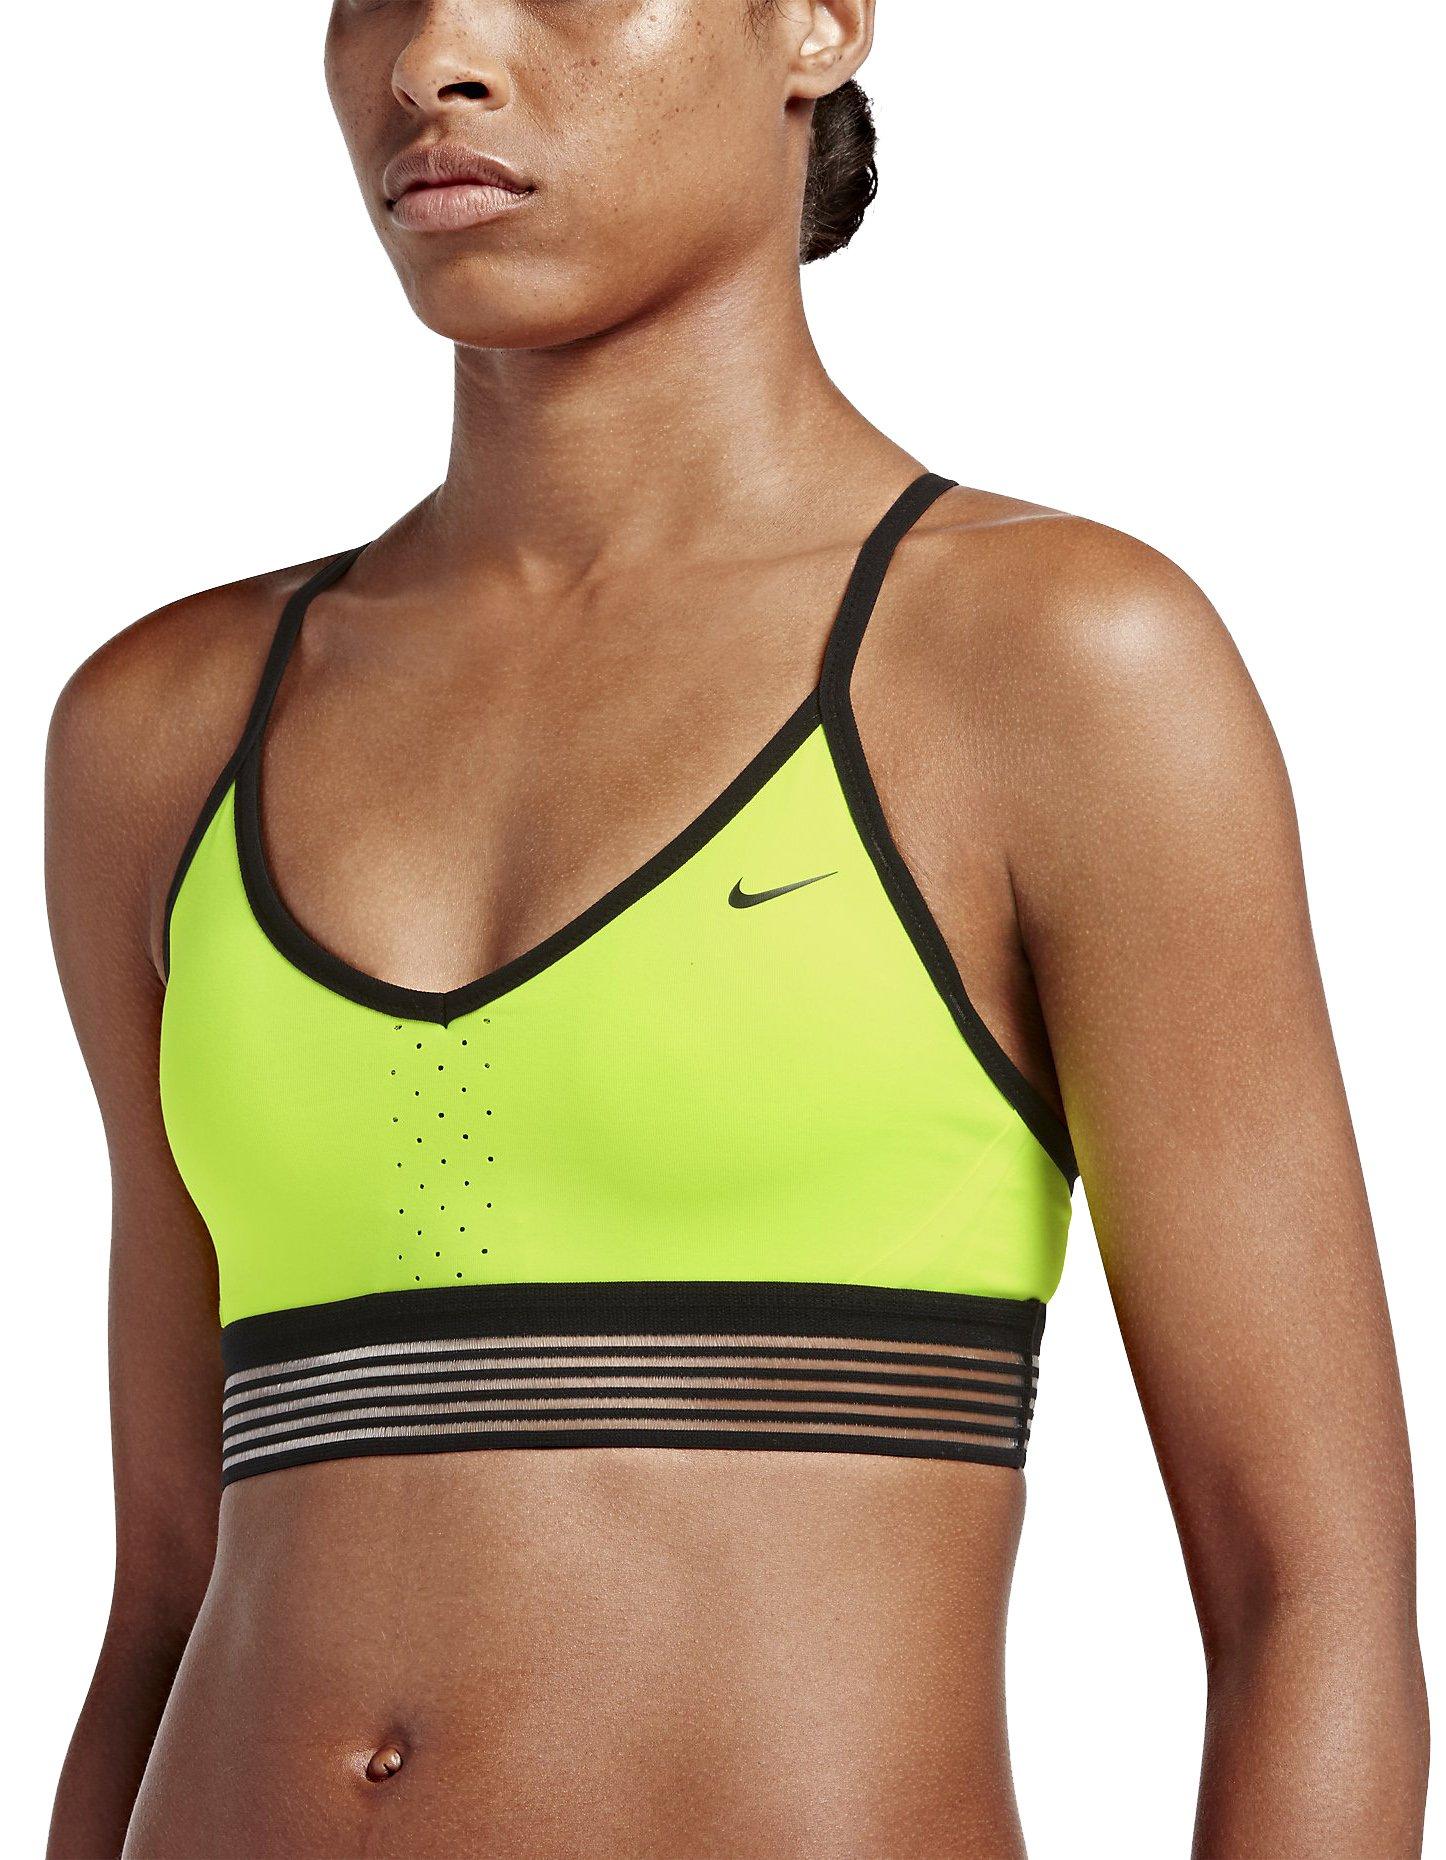 Podprsenka Nike NEW  PRO INDY COOL BRA